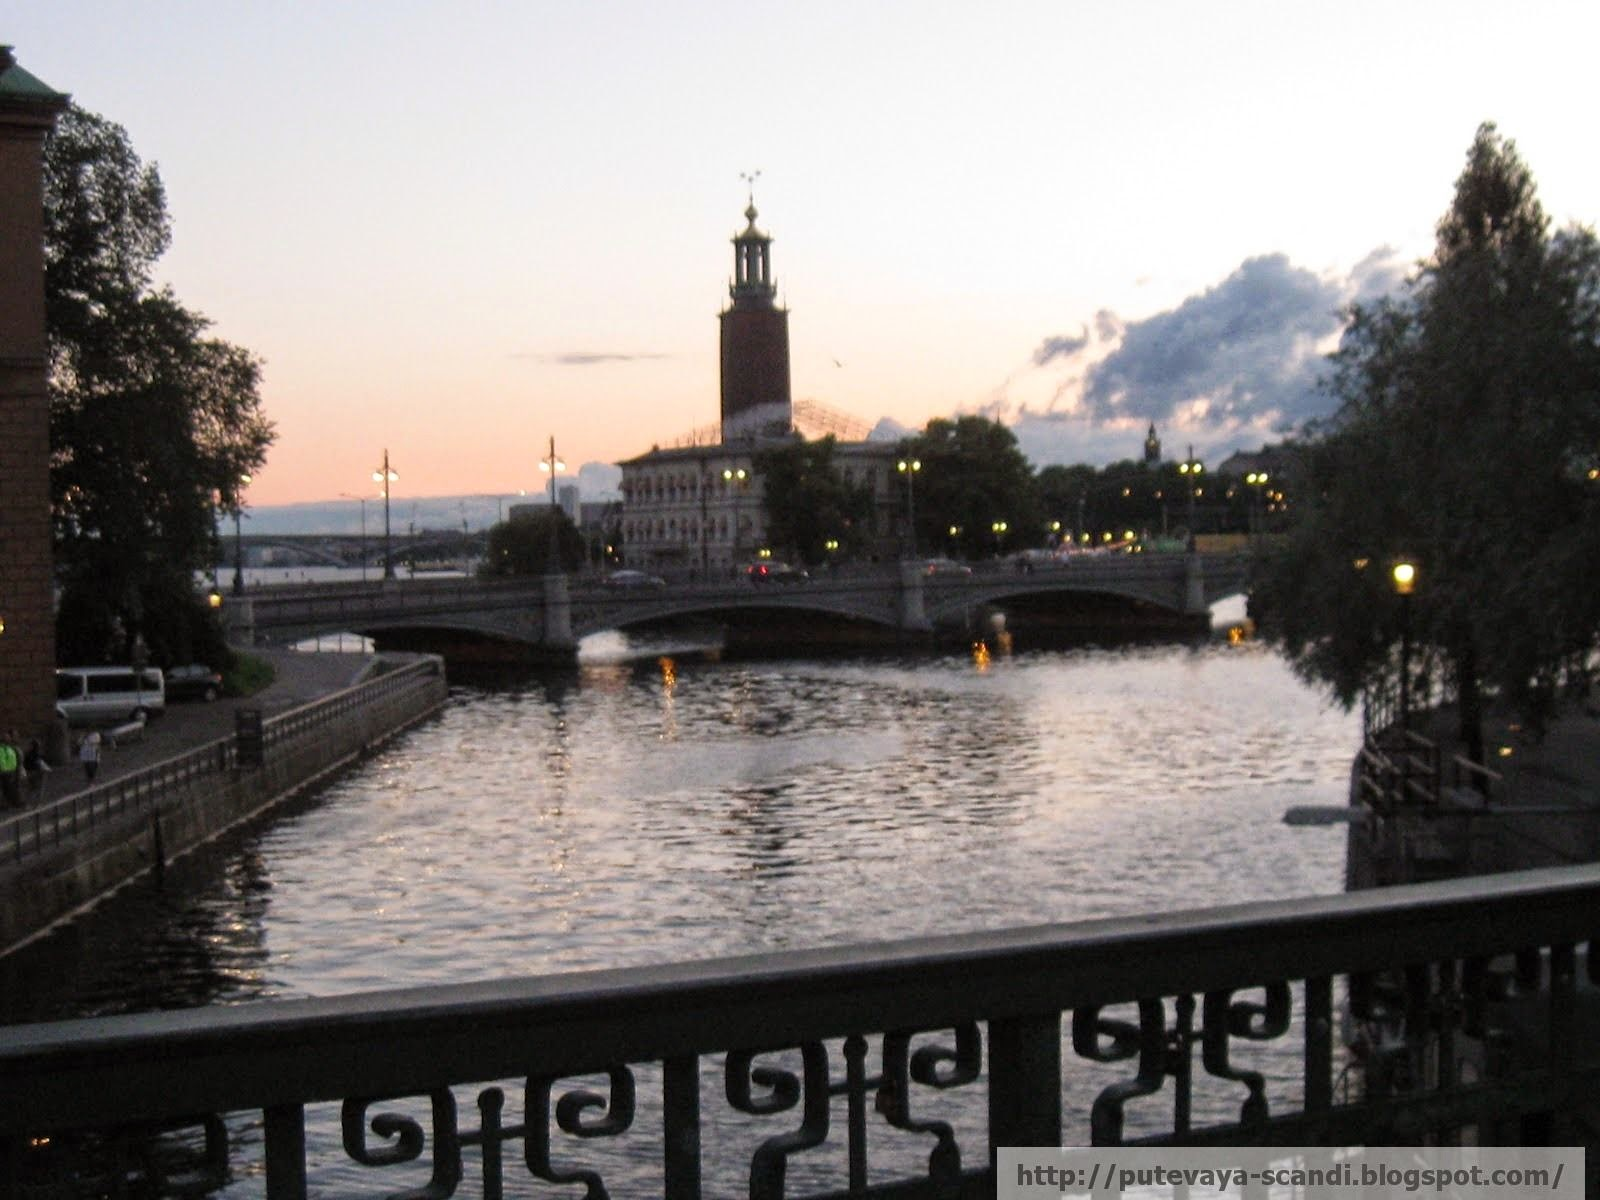 evening Stockholm